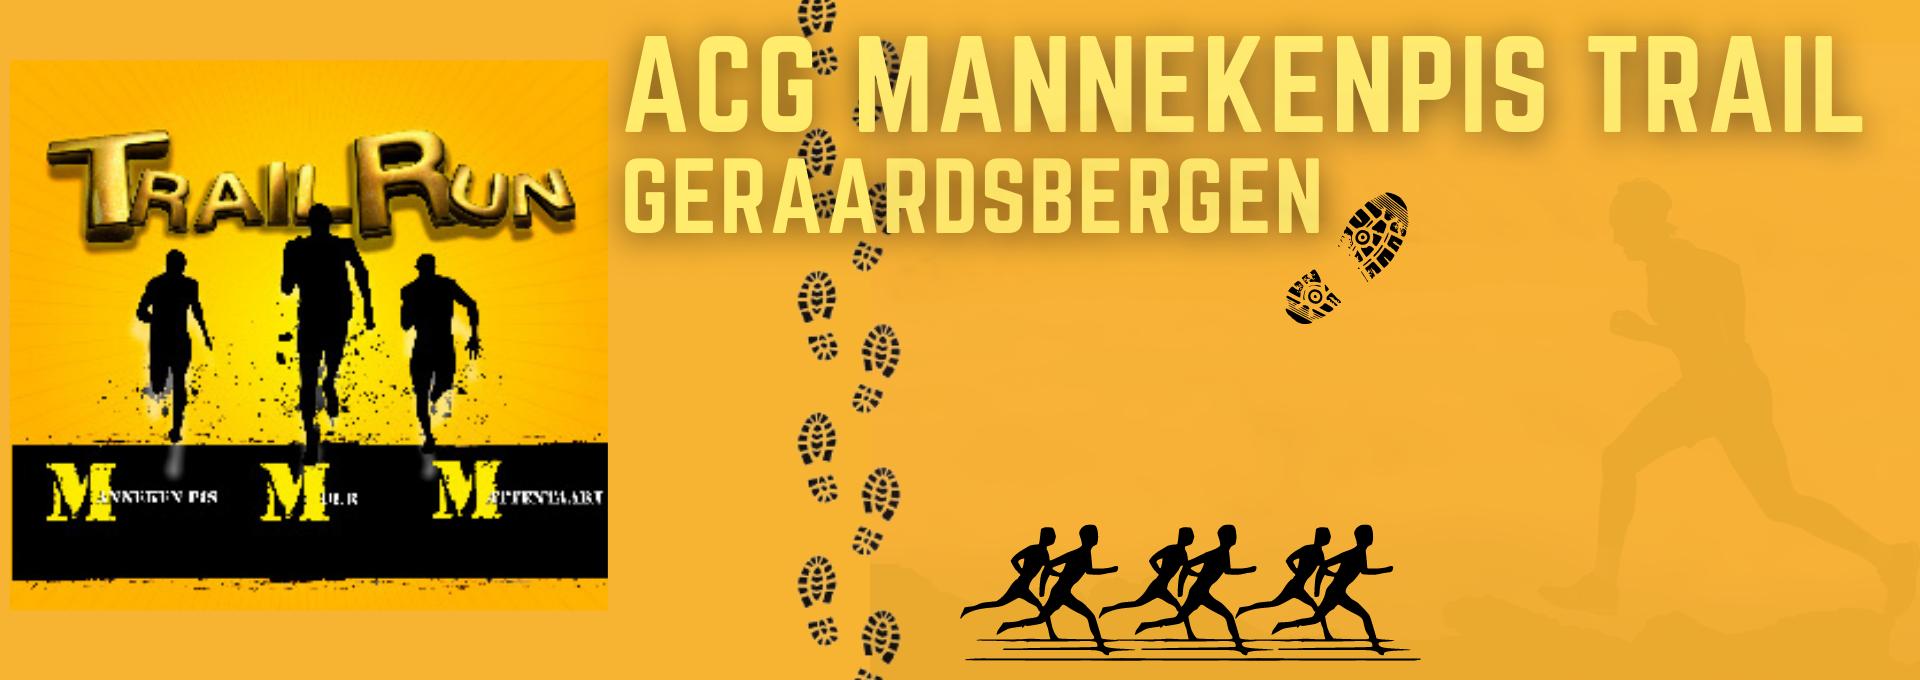 ACG MannekenPis Trail Geraardsbergen